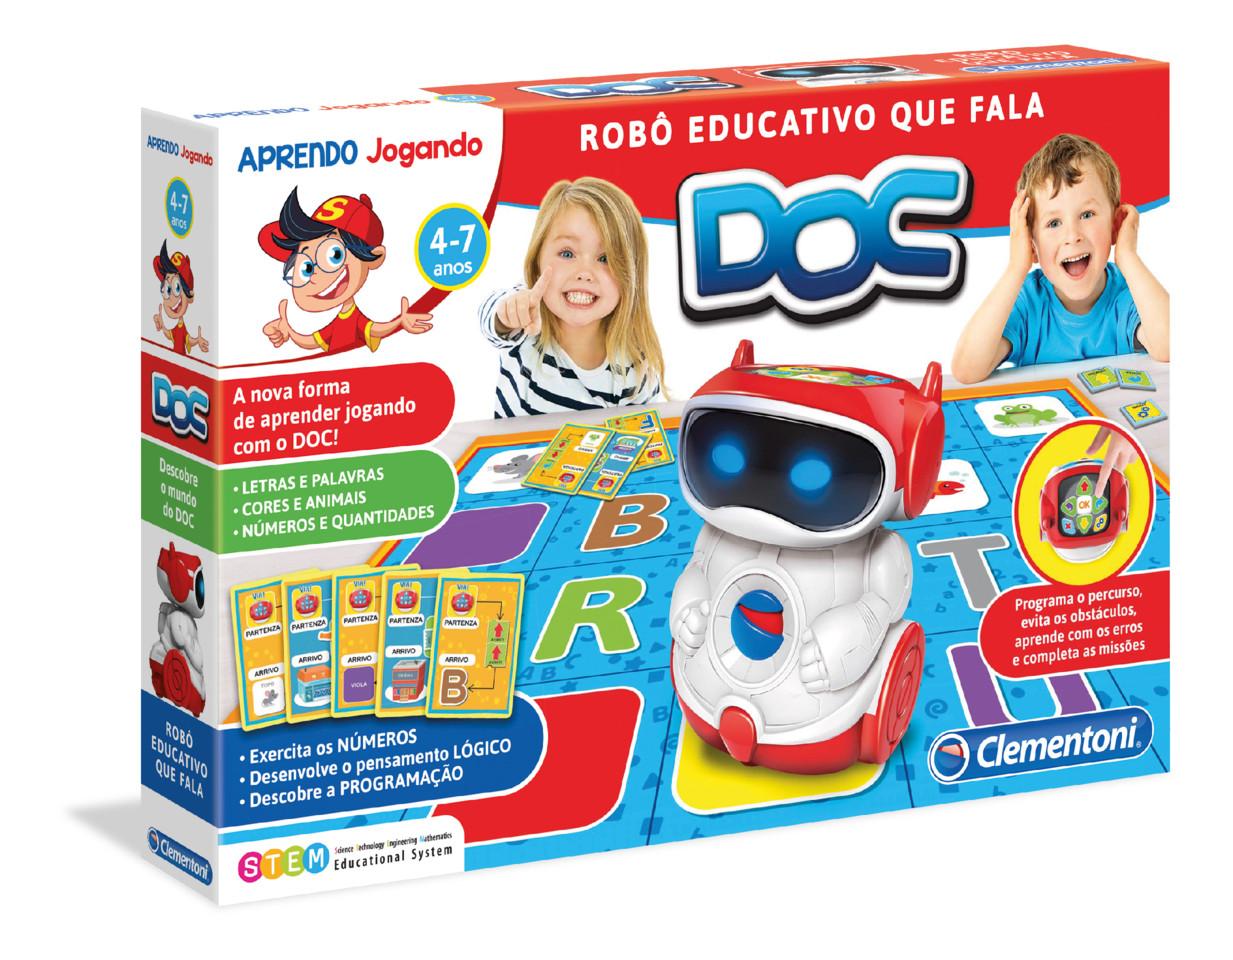 Clementoni Robo DOC 3.jpg